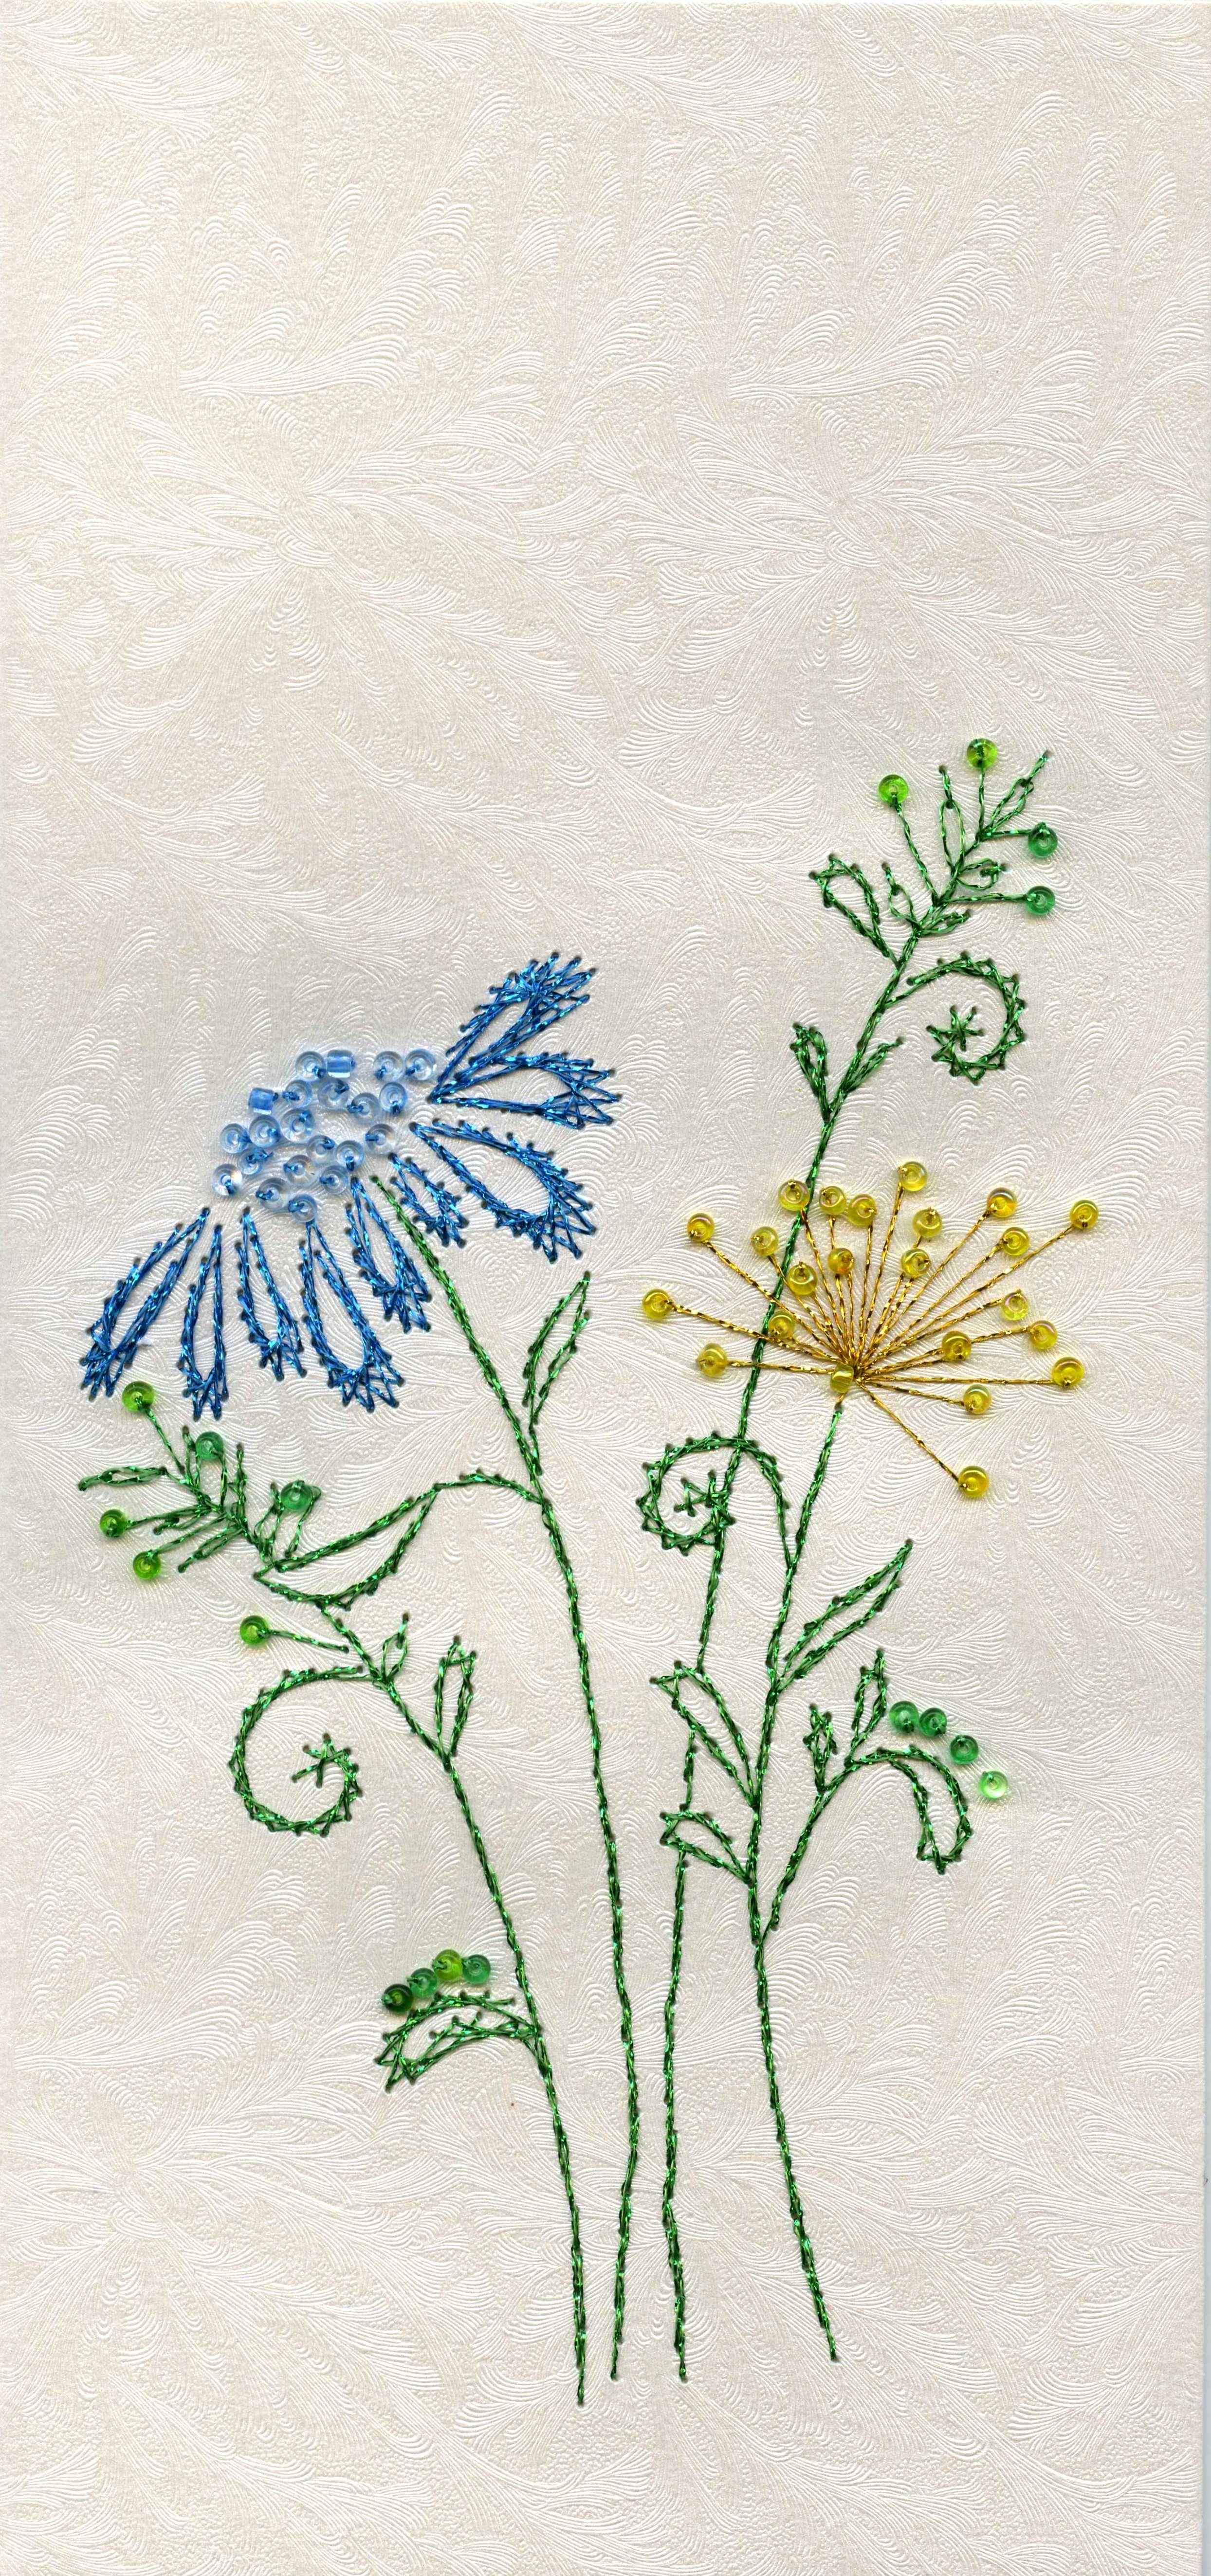 Haft Matematyczny Art N Craft Diy Embroidery Book Art